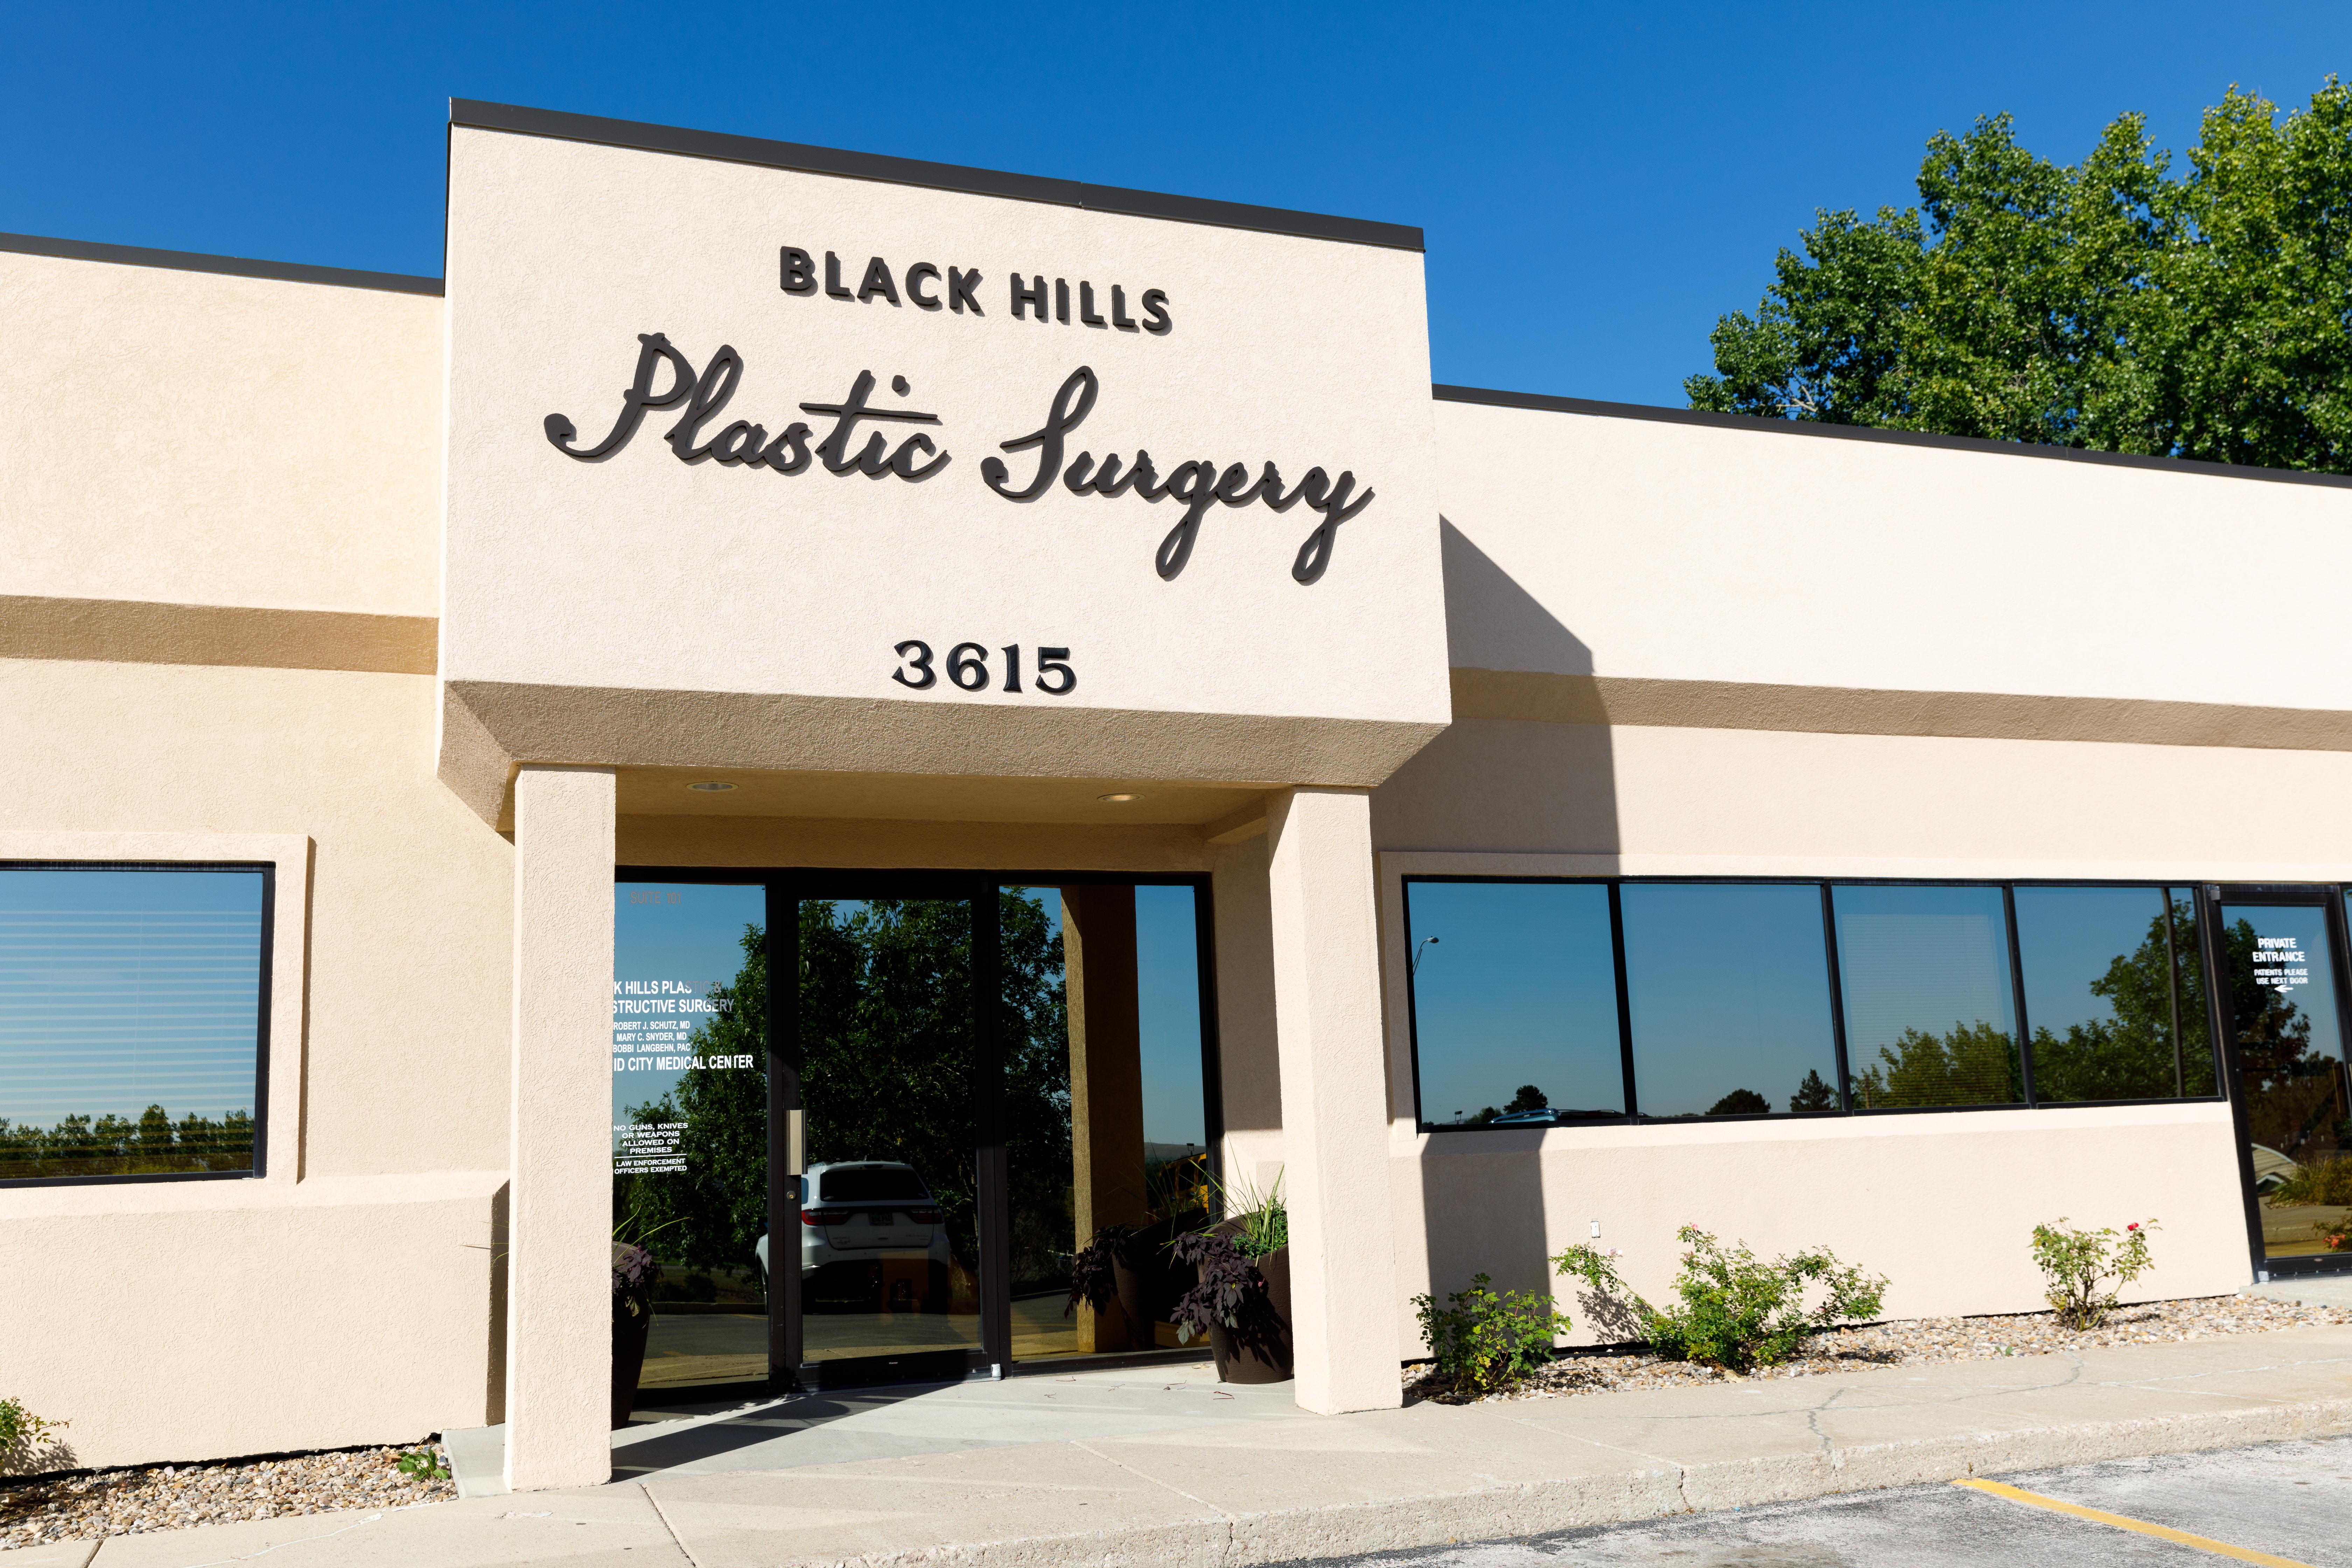 Black Hills Plastic Surgery